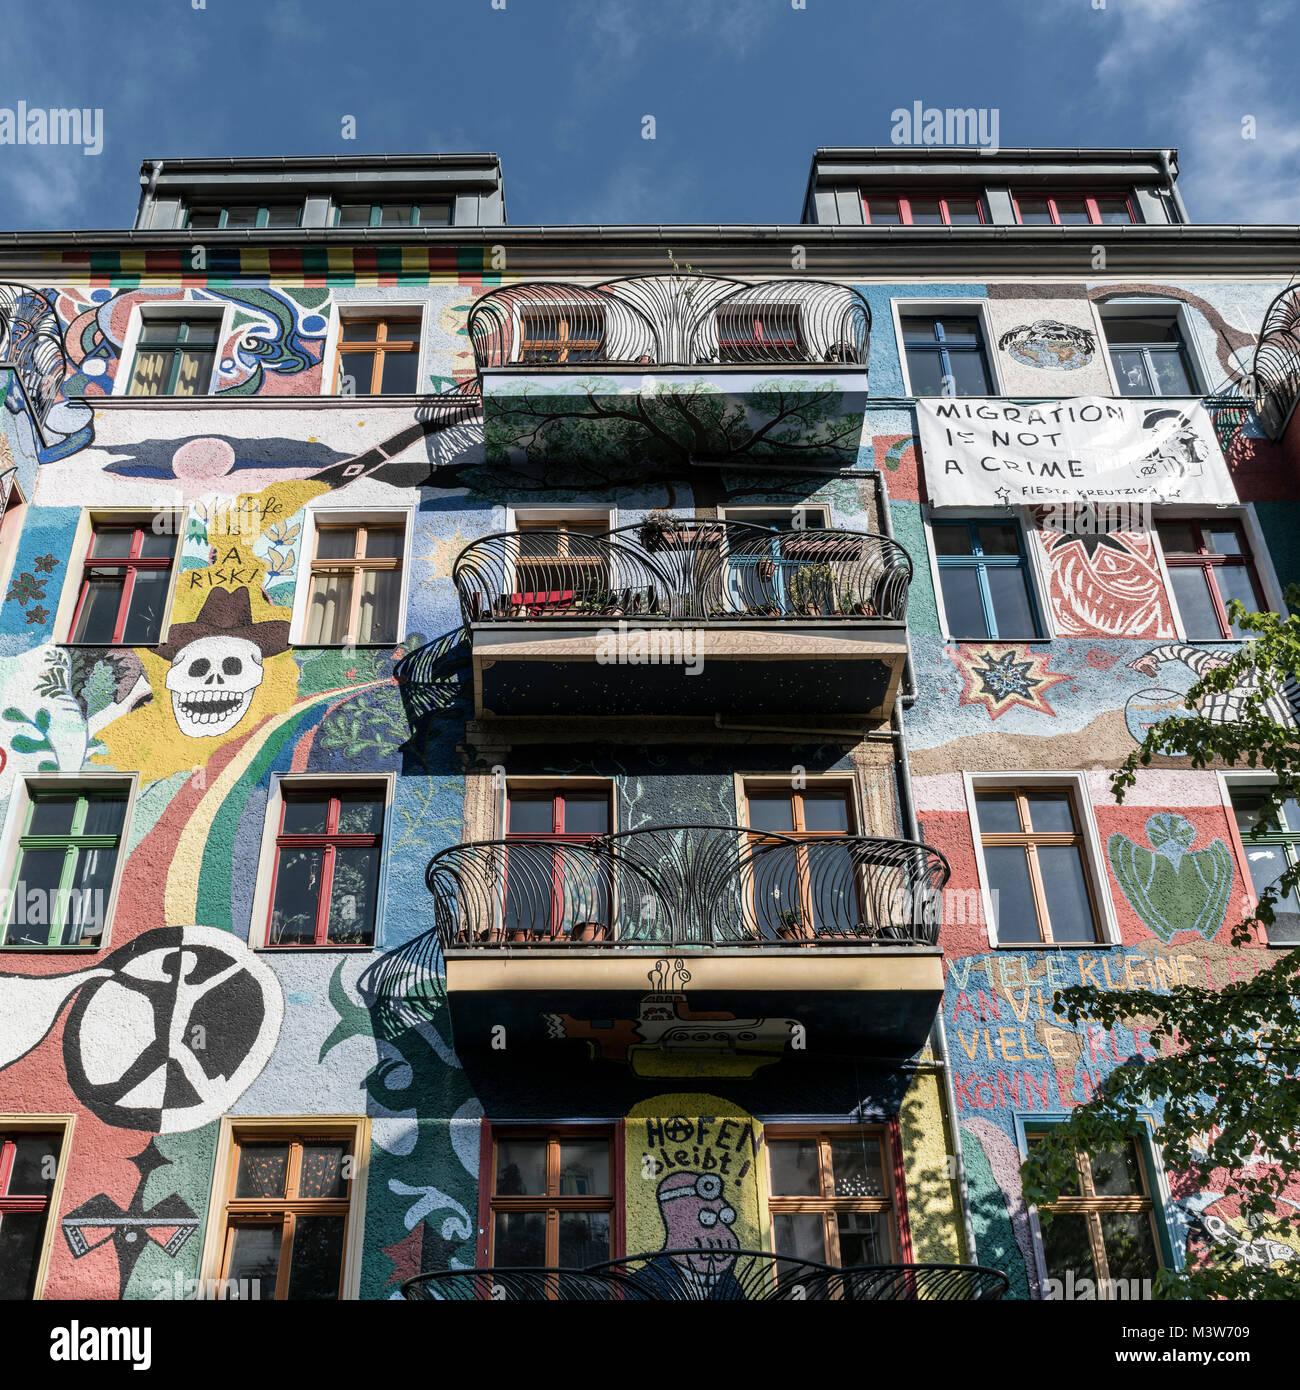 Bemalte Fassade in Friedrichshain, bunte Wandmalerei, Berlin, Deutschland   Wandbild, Friedrichshain, Berlin Stockbild